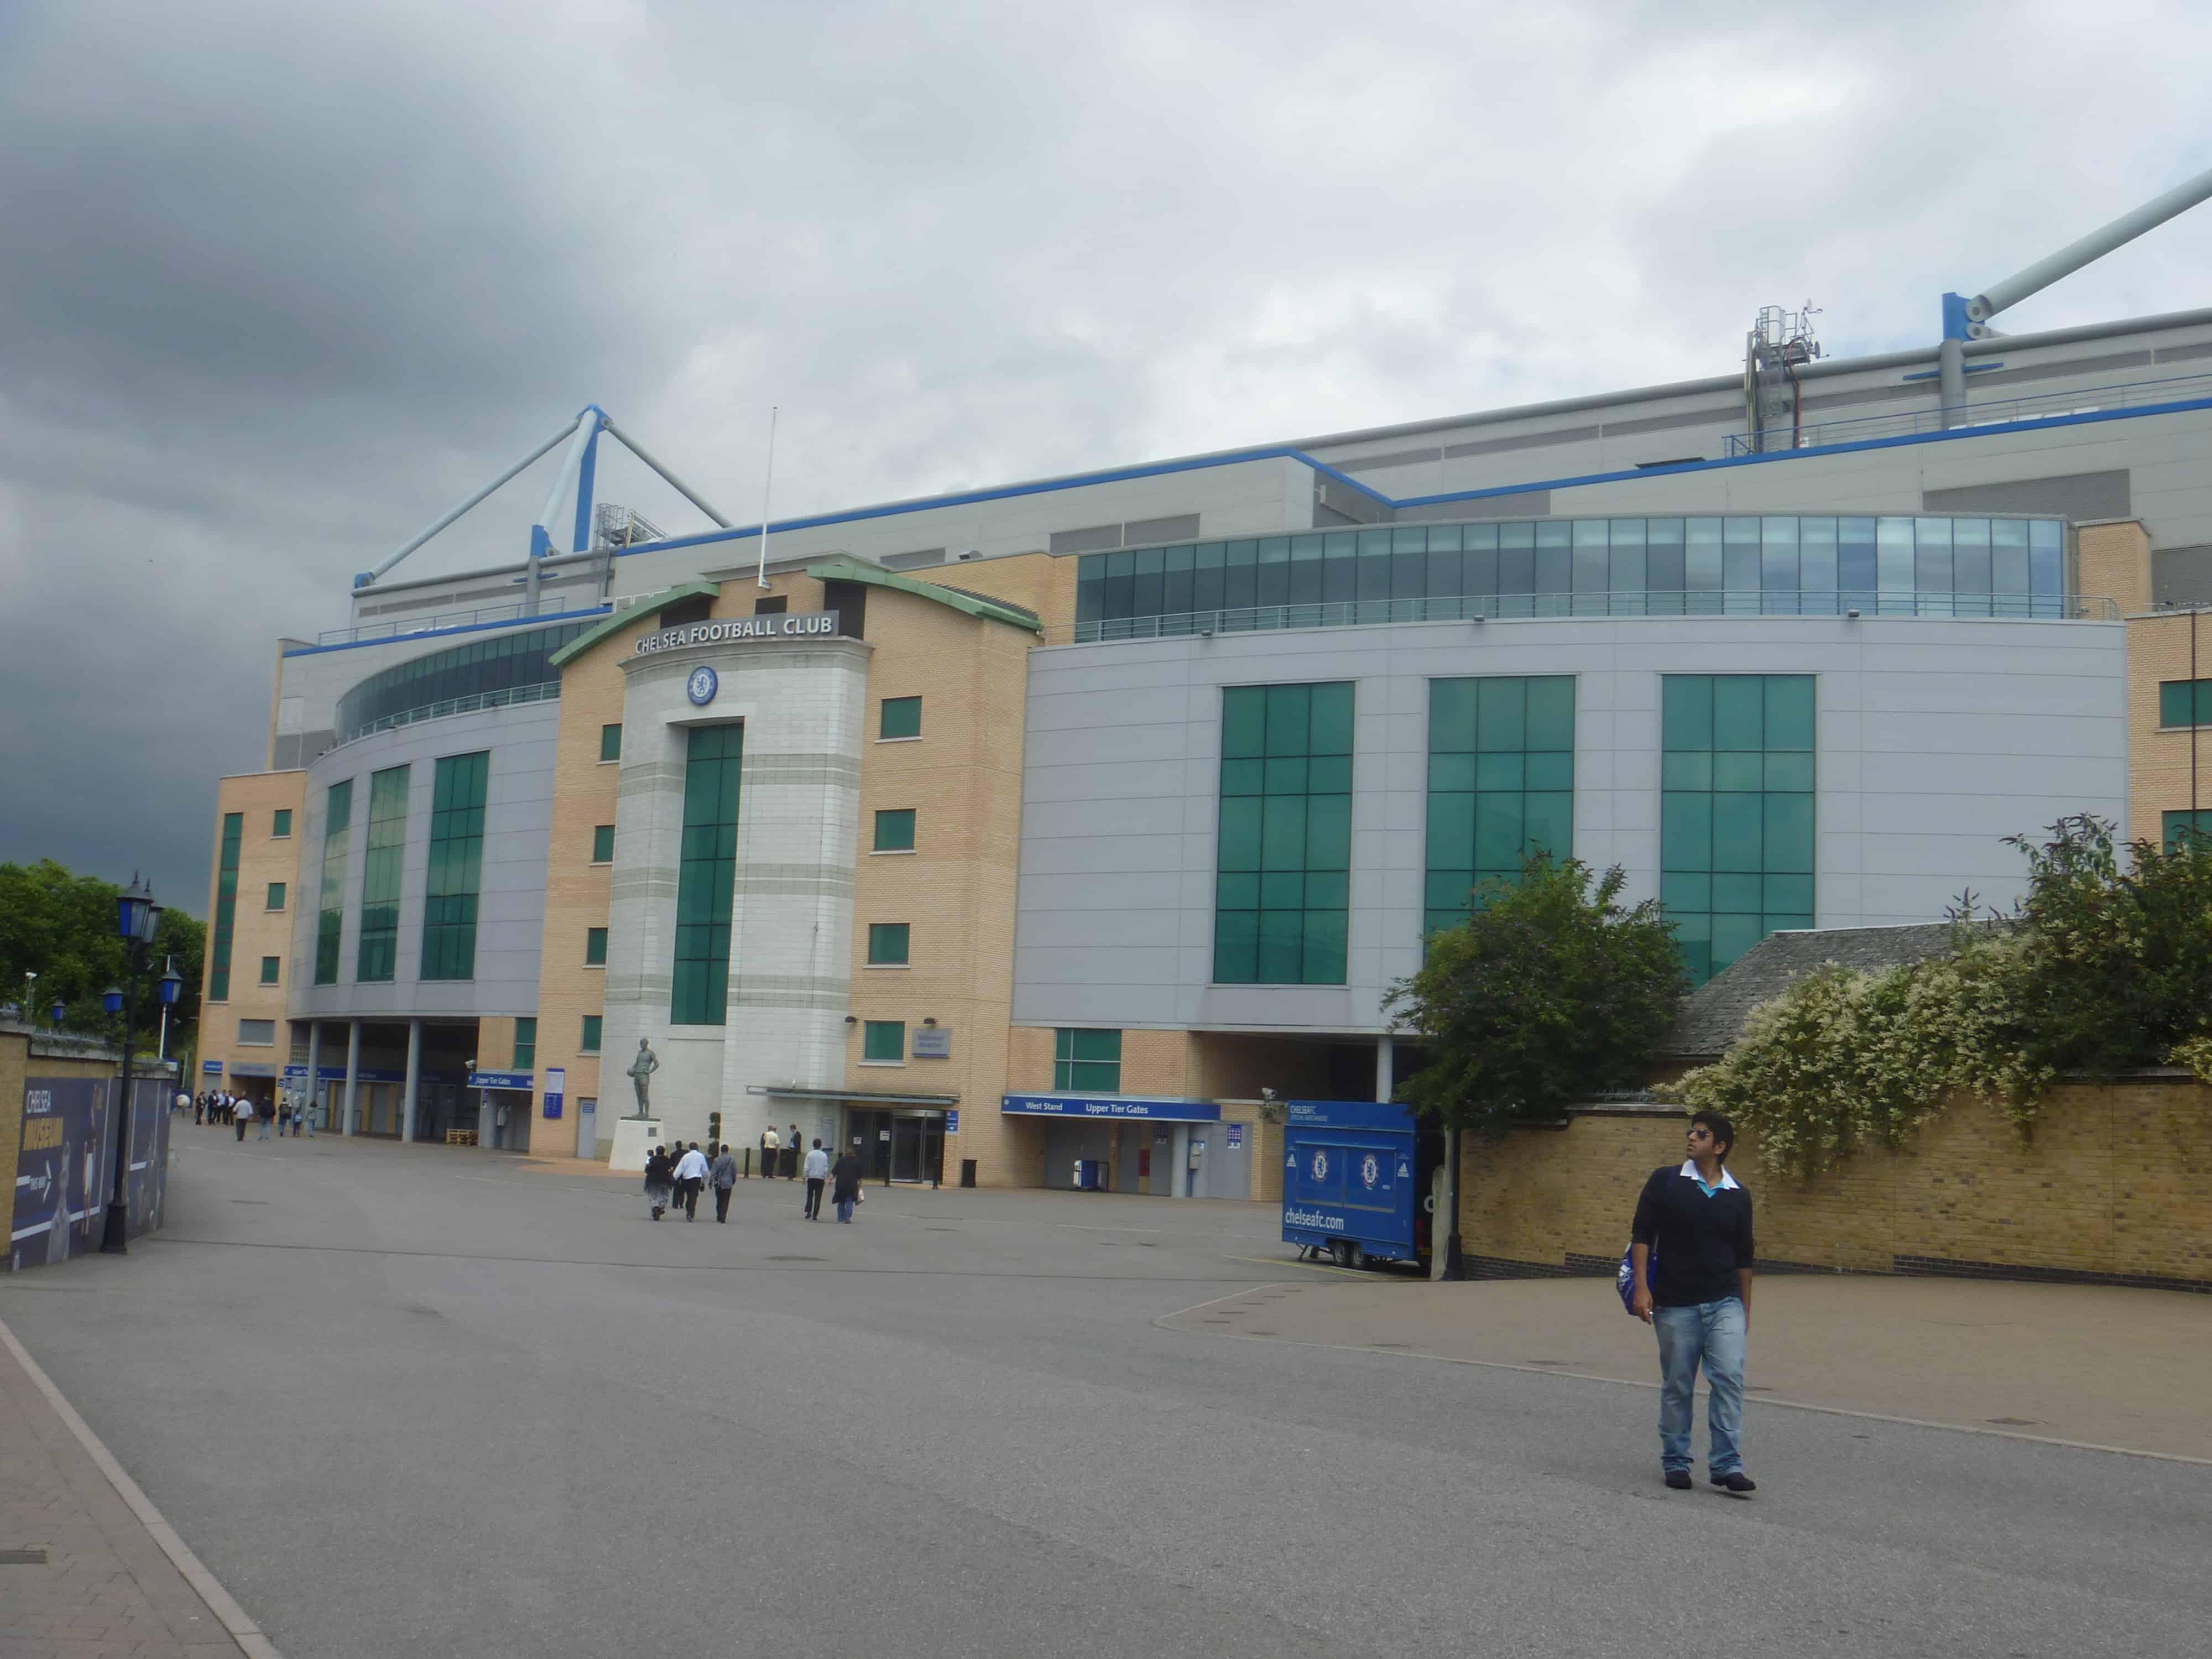 estádio Stamford Bridge